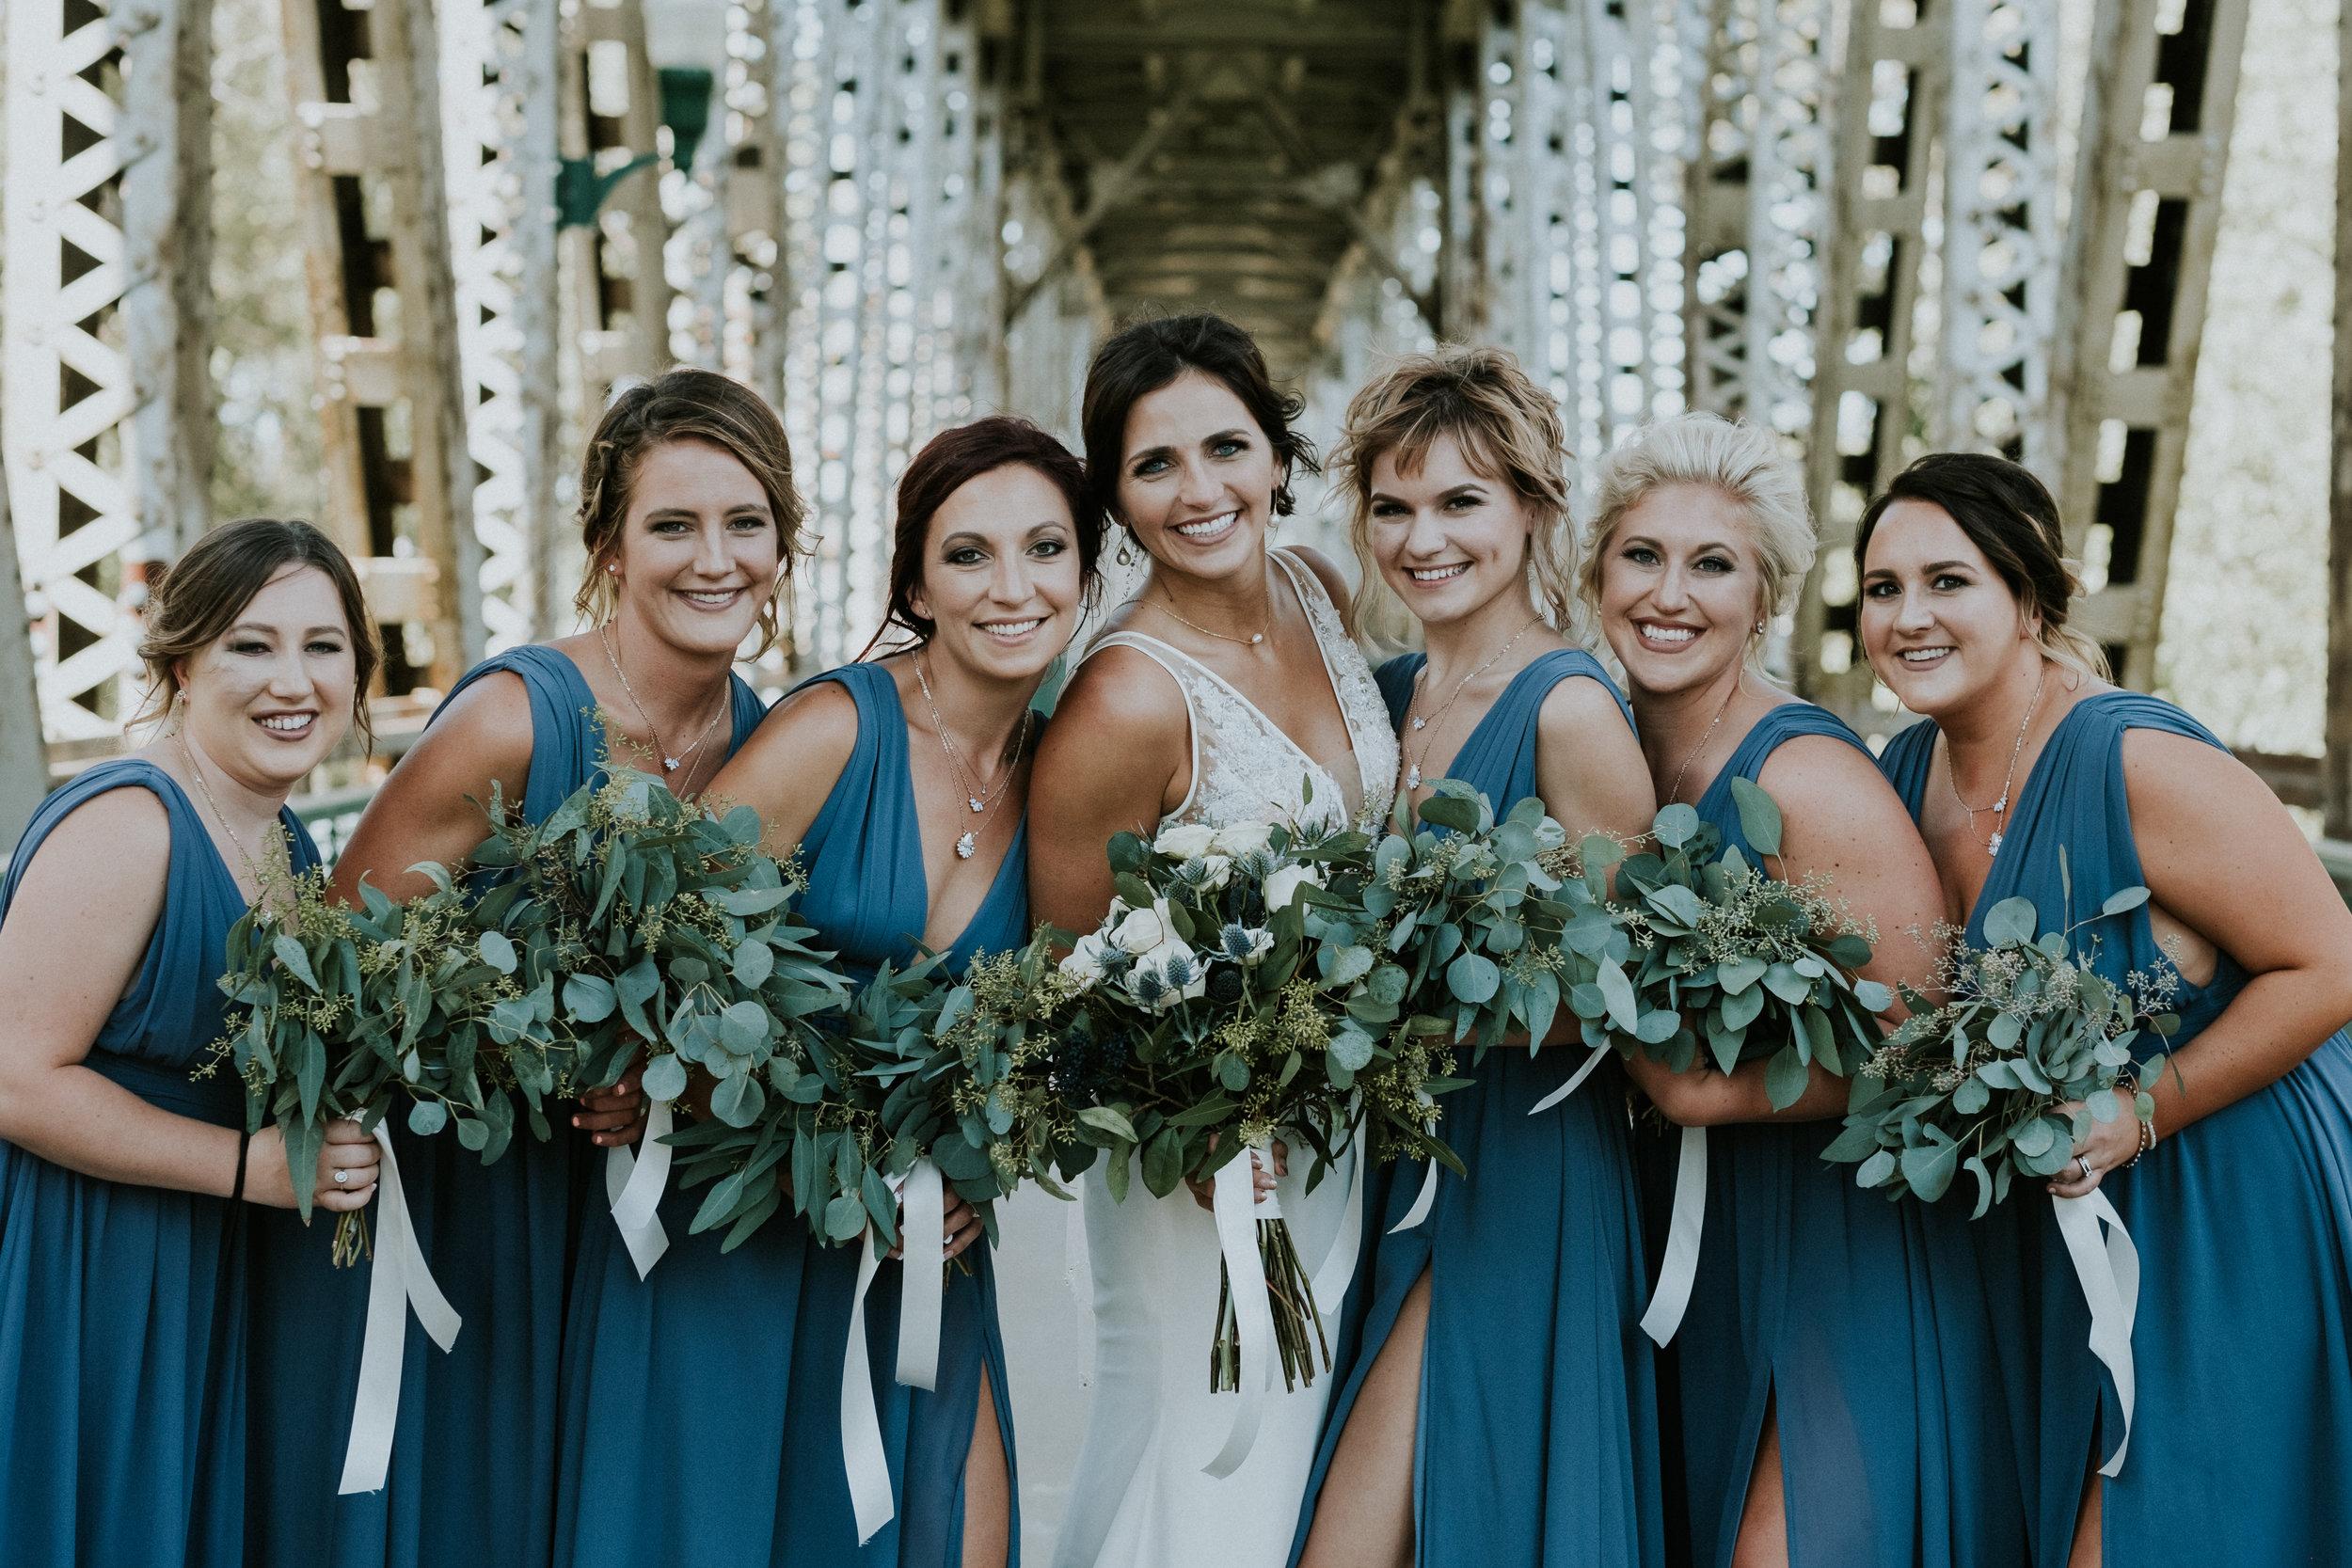 Wedding Photography, near Sioux Falls South Dakota 167.jpg